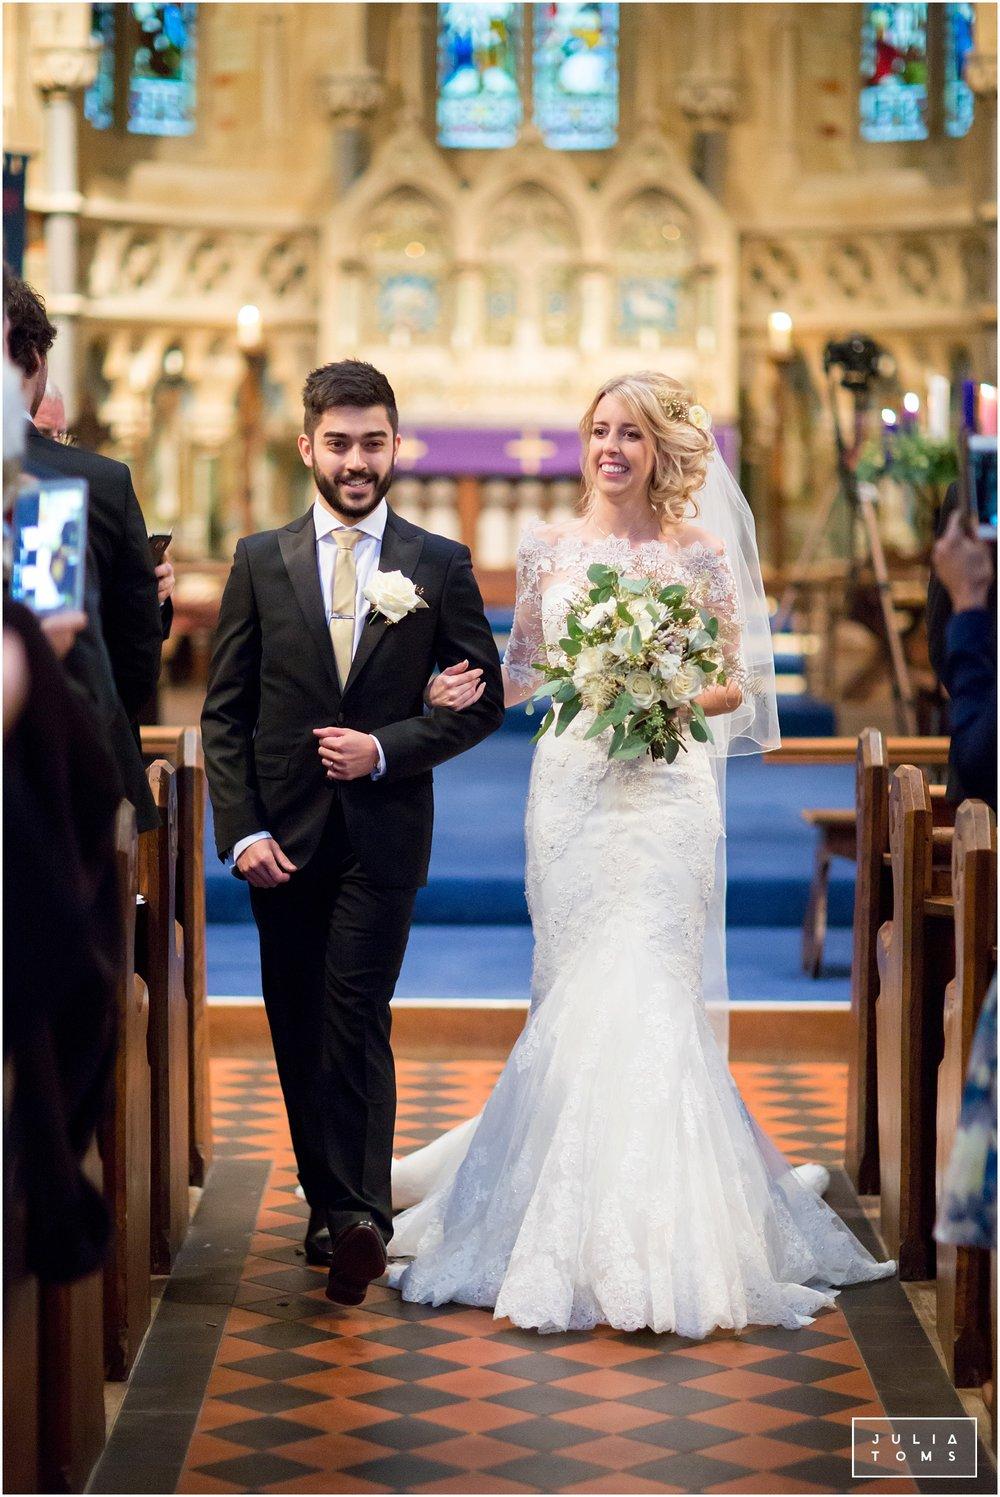 julia_toms_beaumont_estate_wedding_photography_windsor_010.jpg